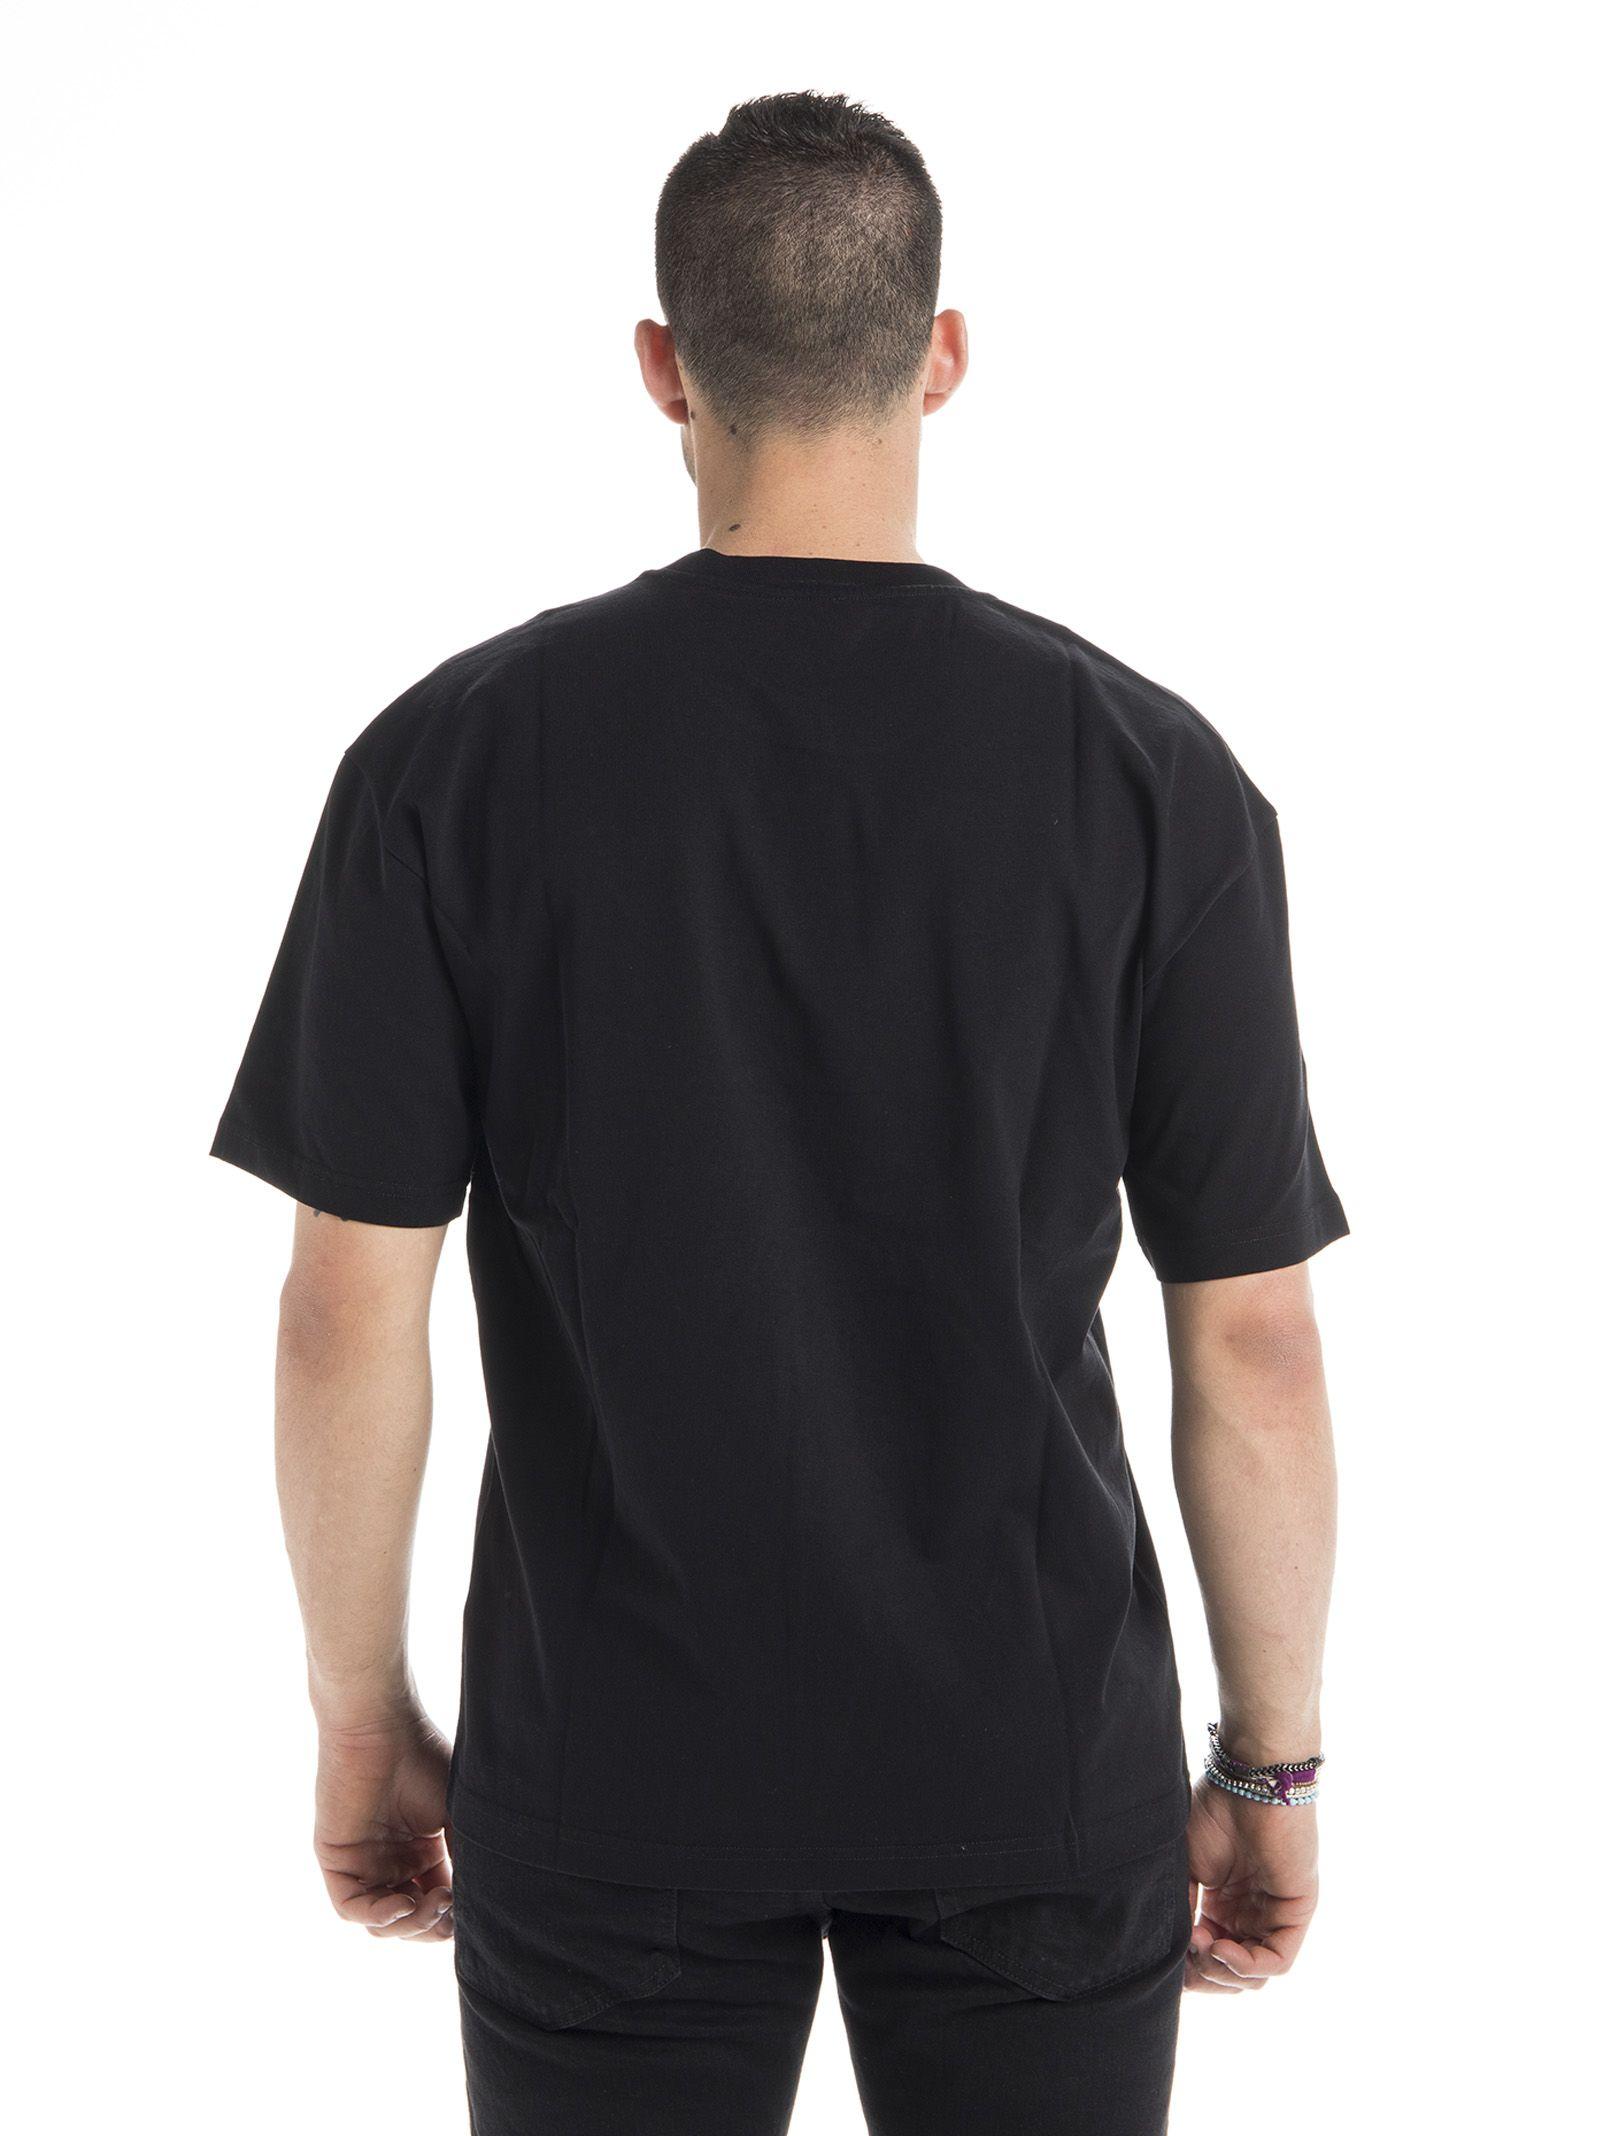 7d22c50e Kenzo Kenzo Neon Tiger Print T-shirt - Black - 10907895   italist